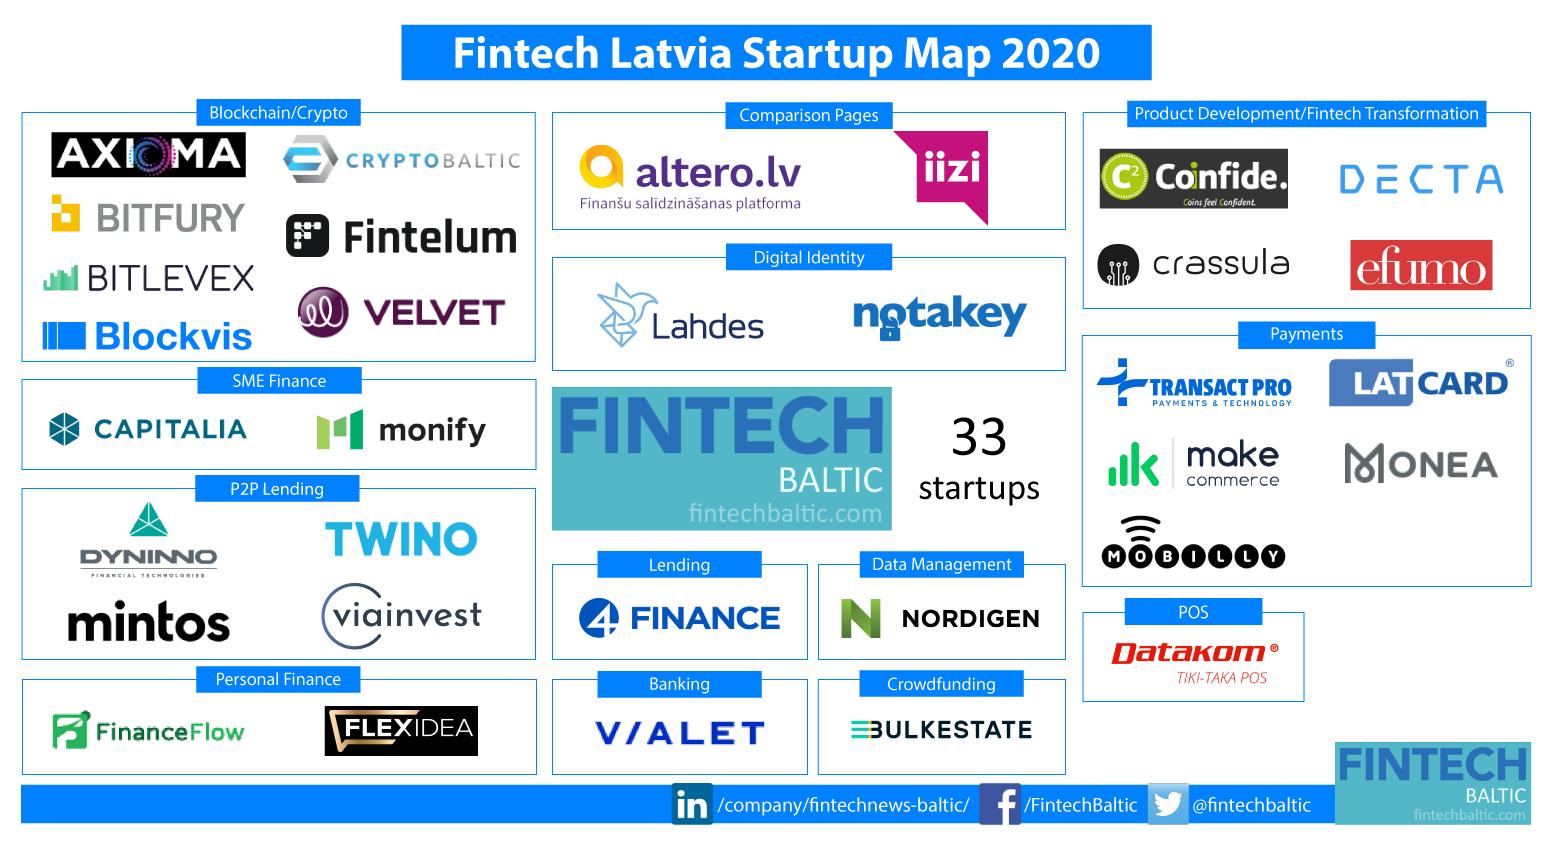 Latvia Fintech Map